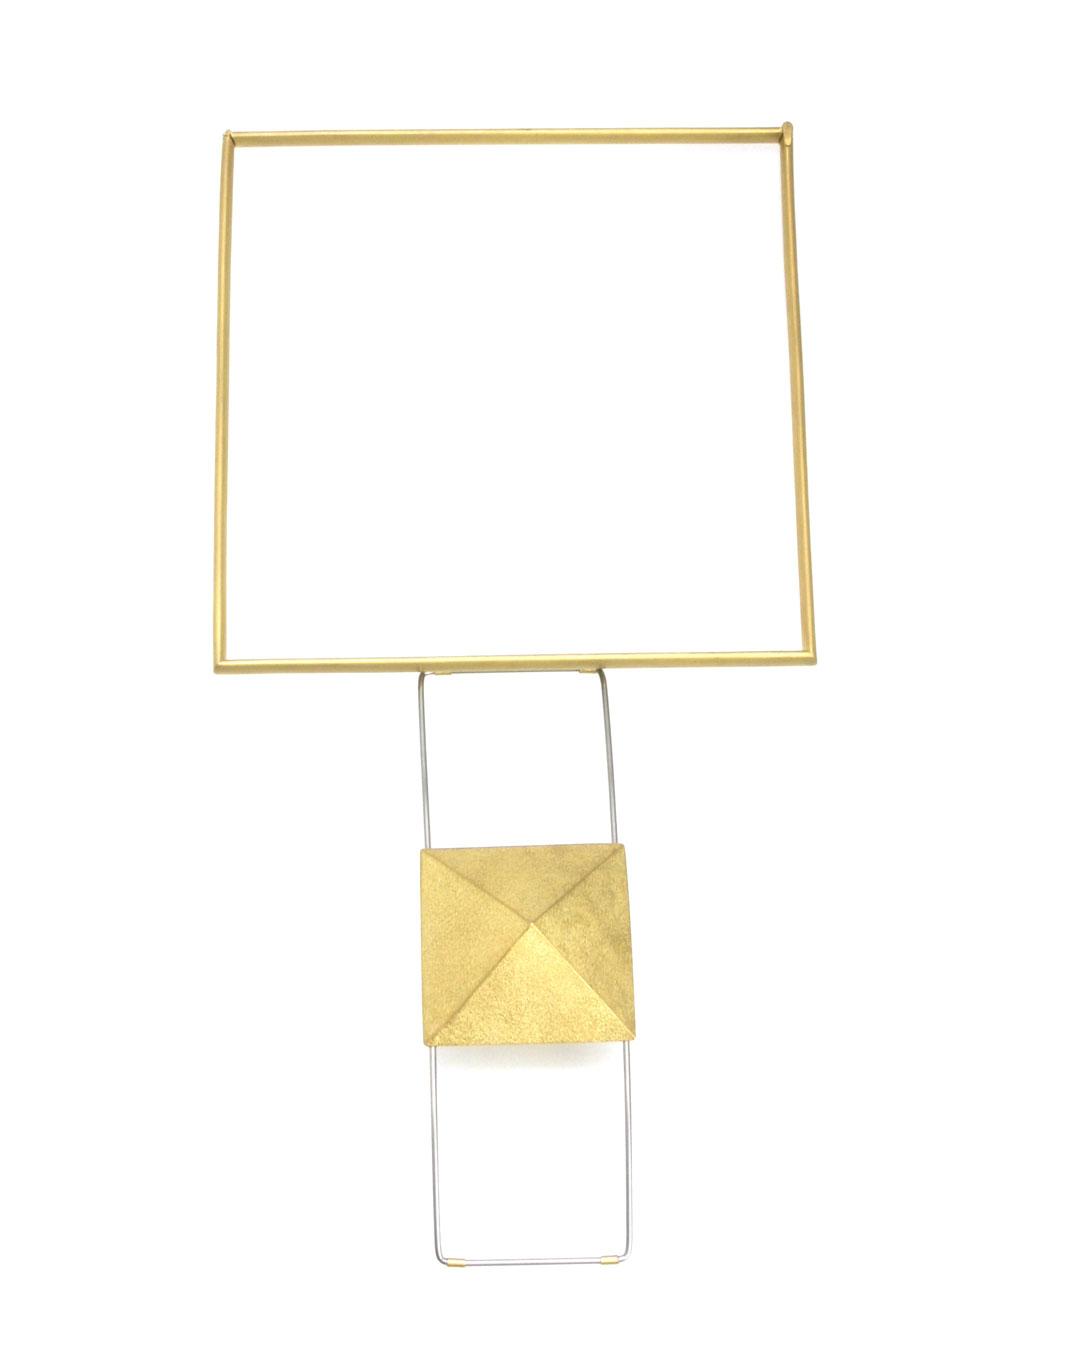 Okinari Kurokawa, untitled, 2007, necklace; 20ct gold, stainless steel, 139 x 139 x 38 mm,